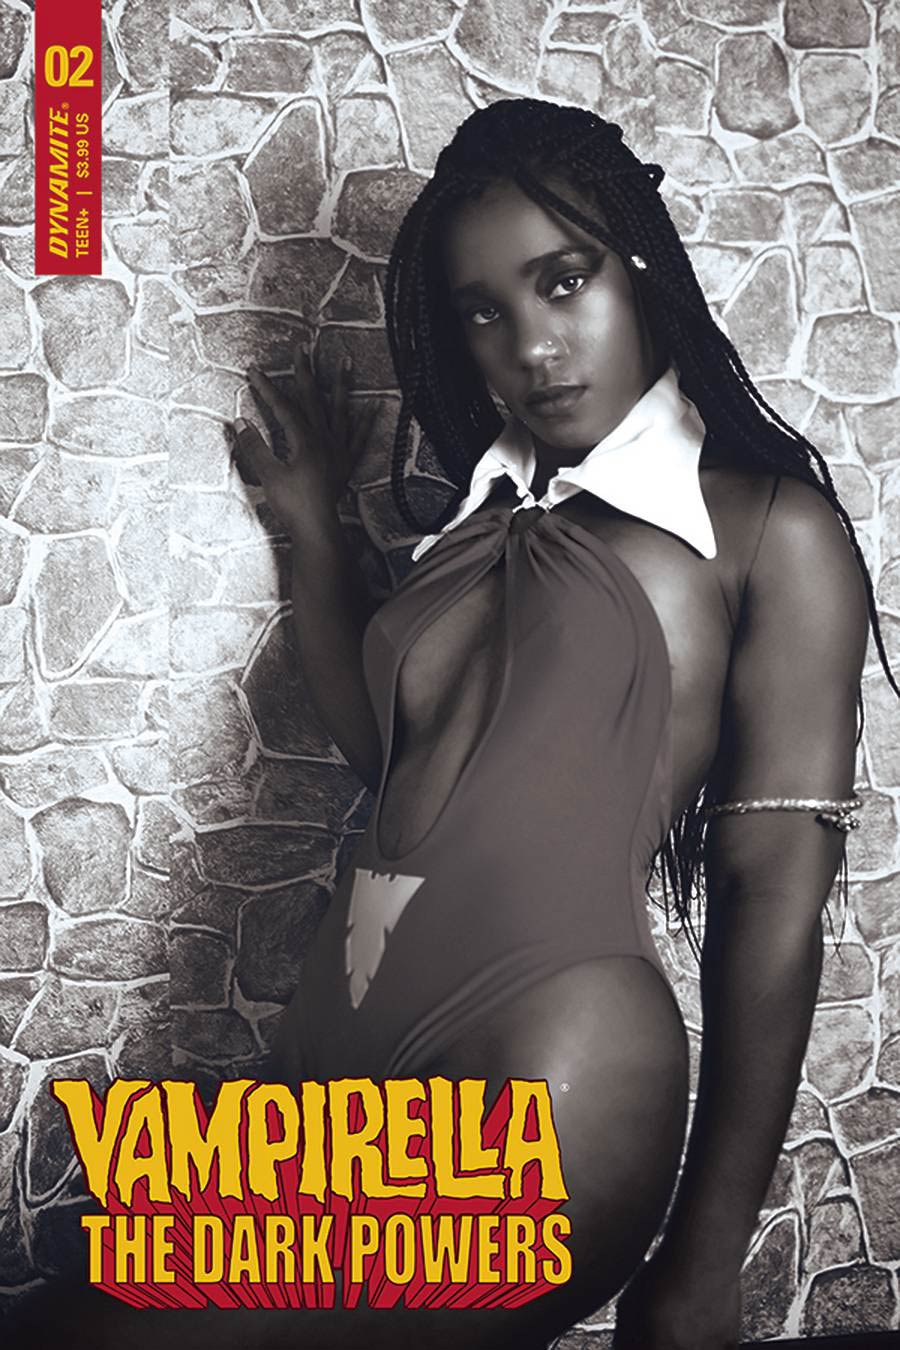 Vampirella The Dark Powers #2 Cover J Incentive Vanta Black Cosplay Photo Black & White Cover